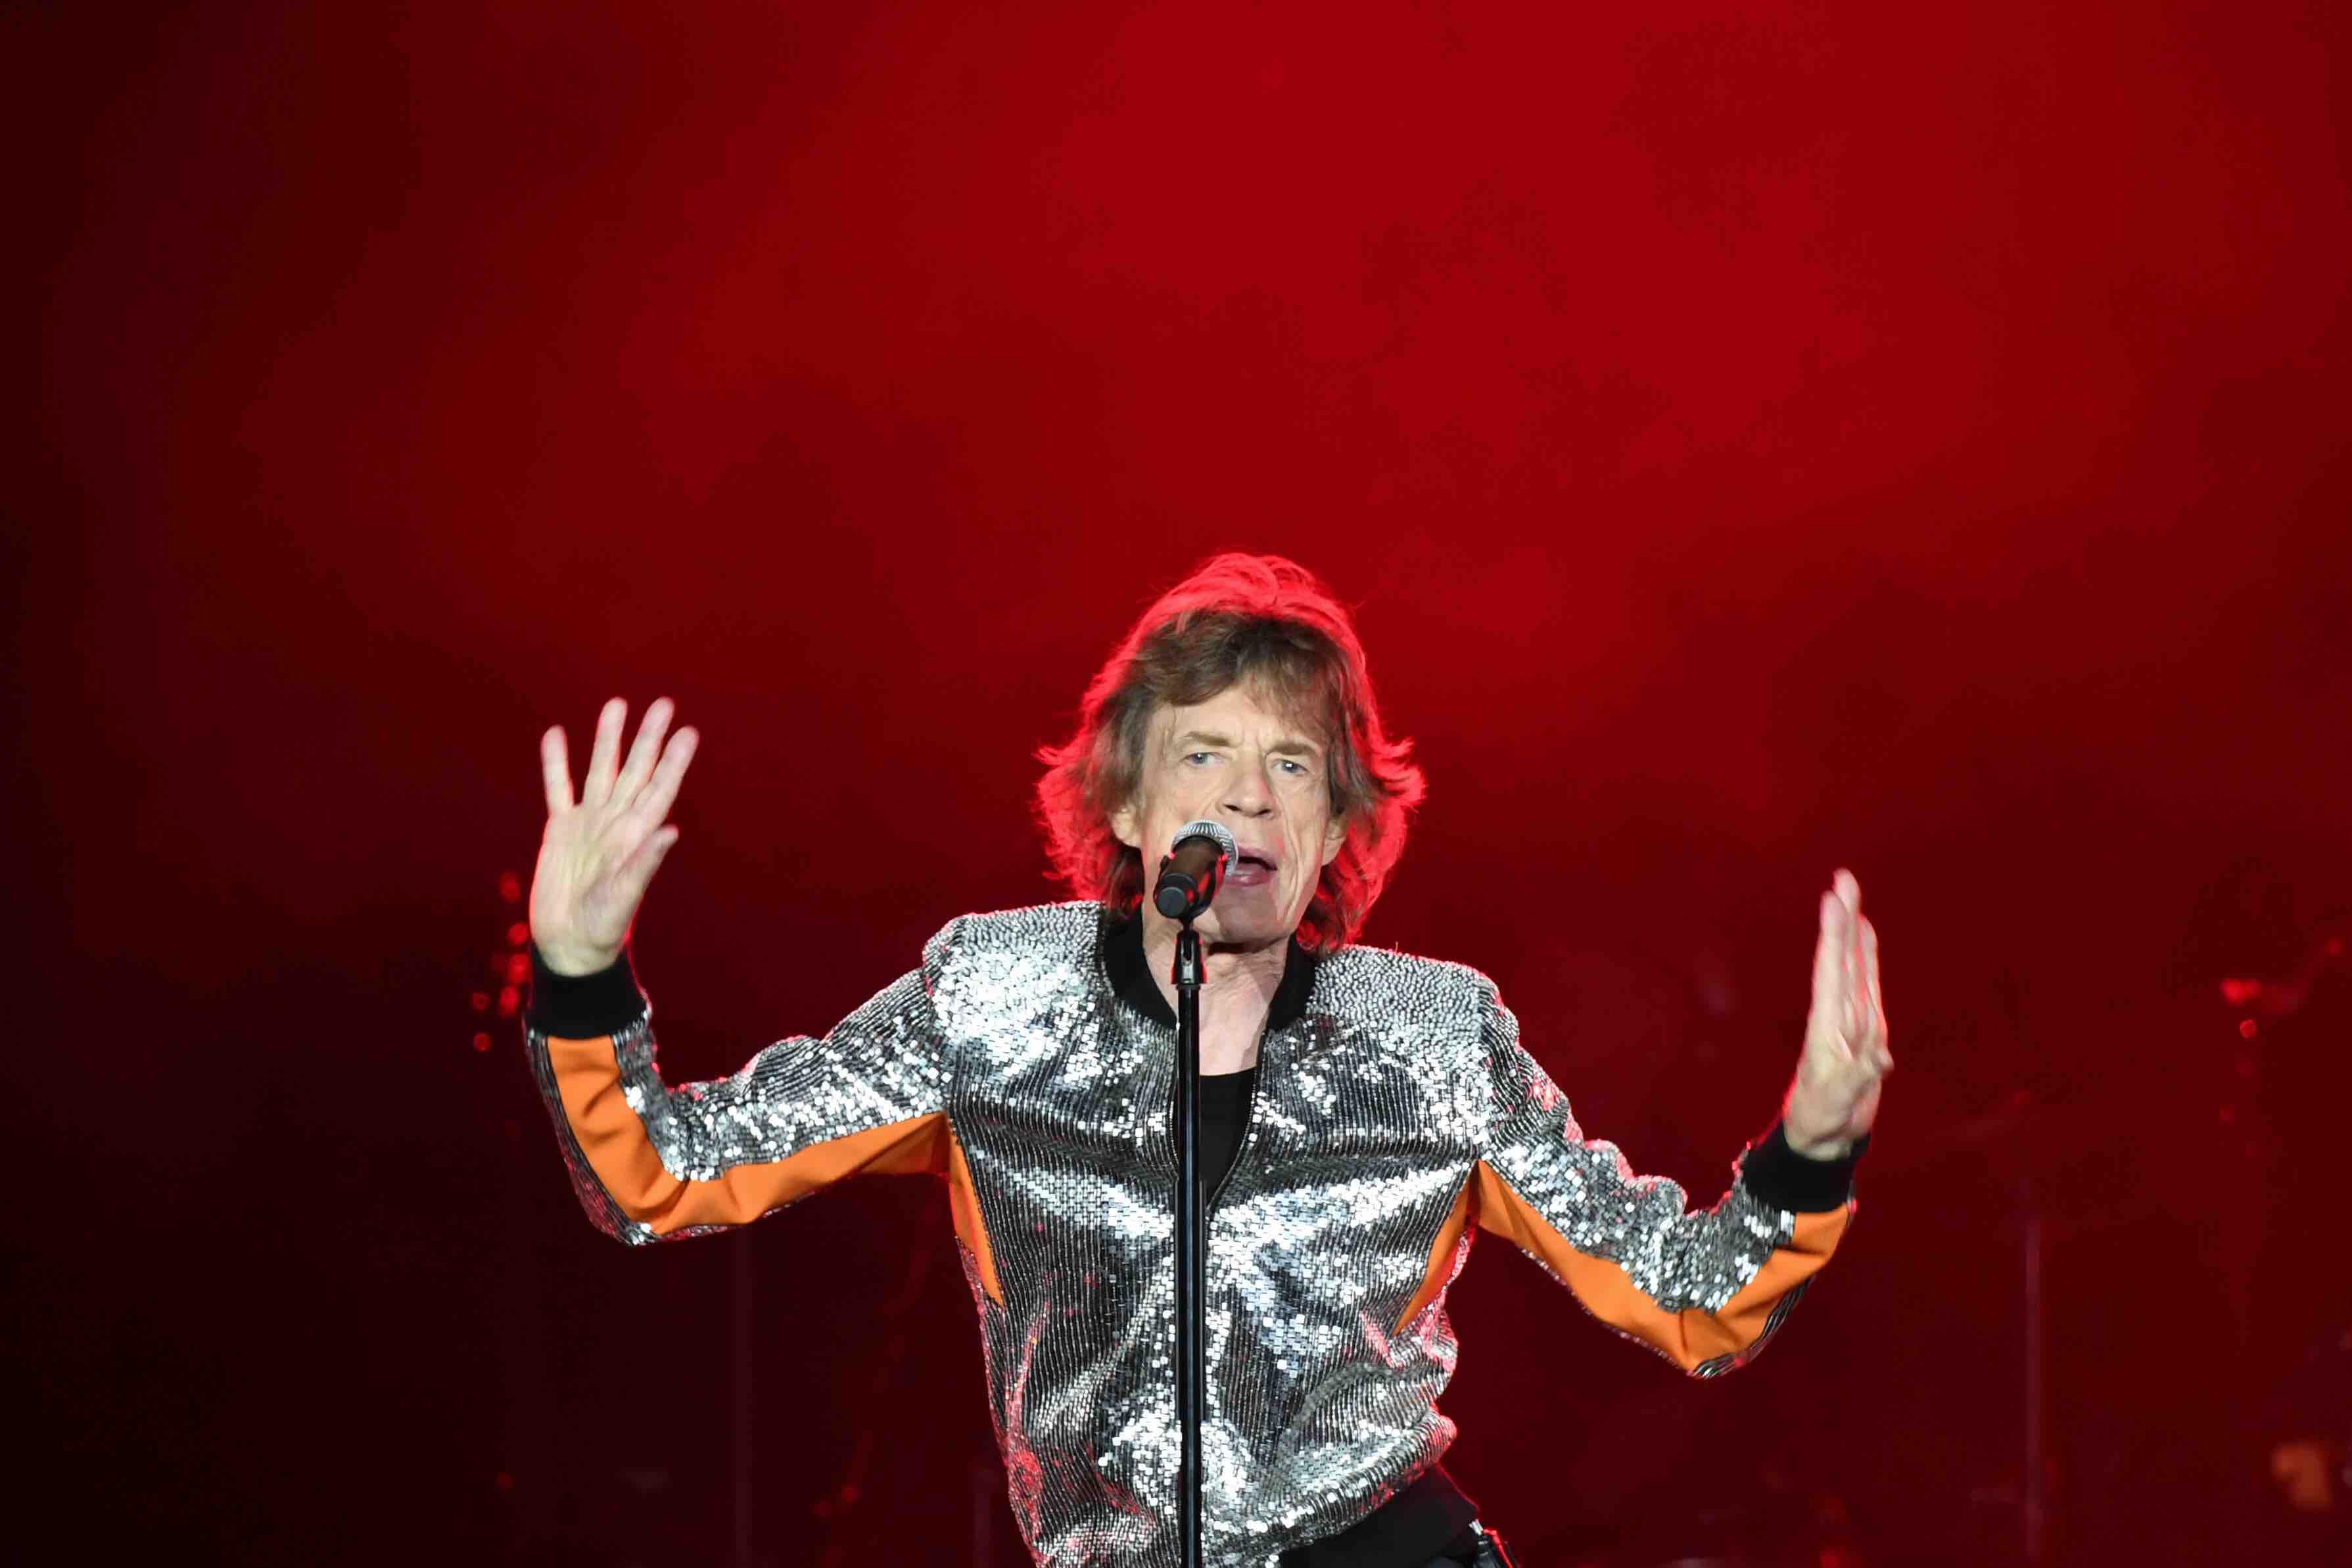 Rolling Stones Mick Jagger Vergnügte Sich In Berliner Fetisch Club